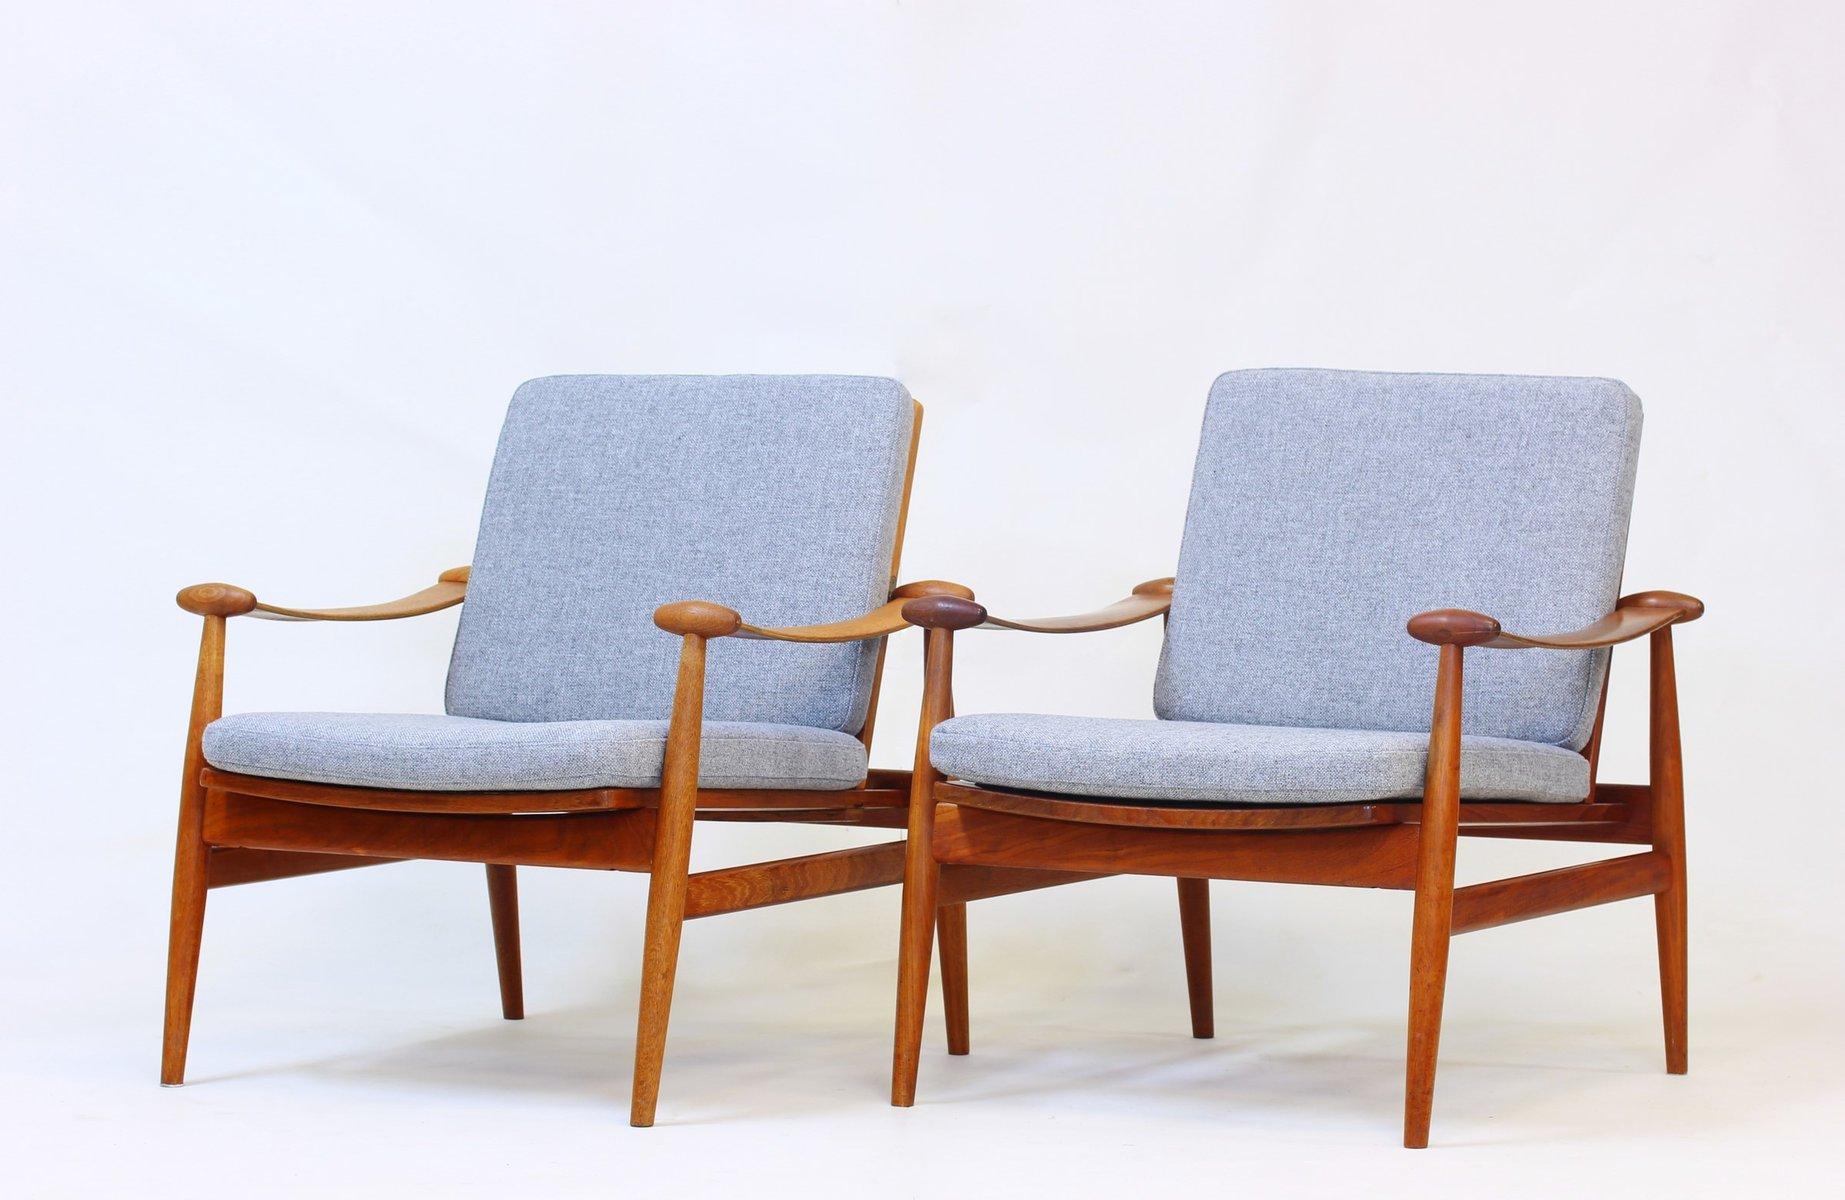 vintage spade chair sessel von finn juhl f r france son 1961 2er set bei pamono kaufen. Black Bedroom Furniture Sets. Home Design Ideas